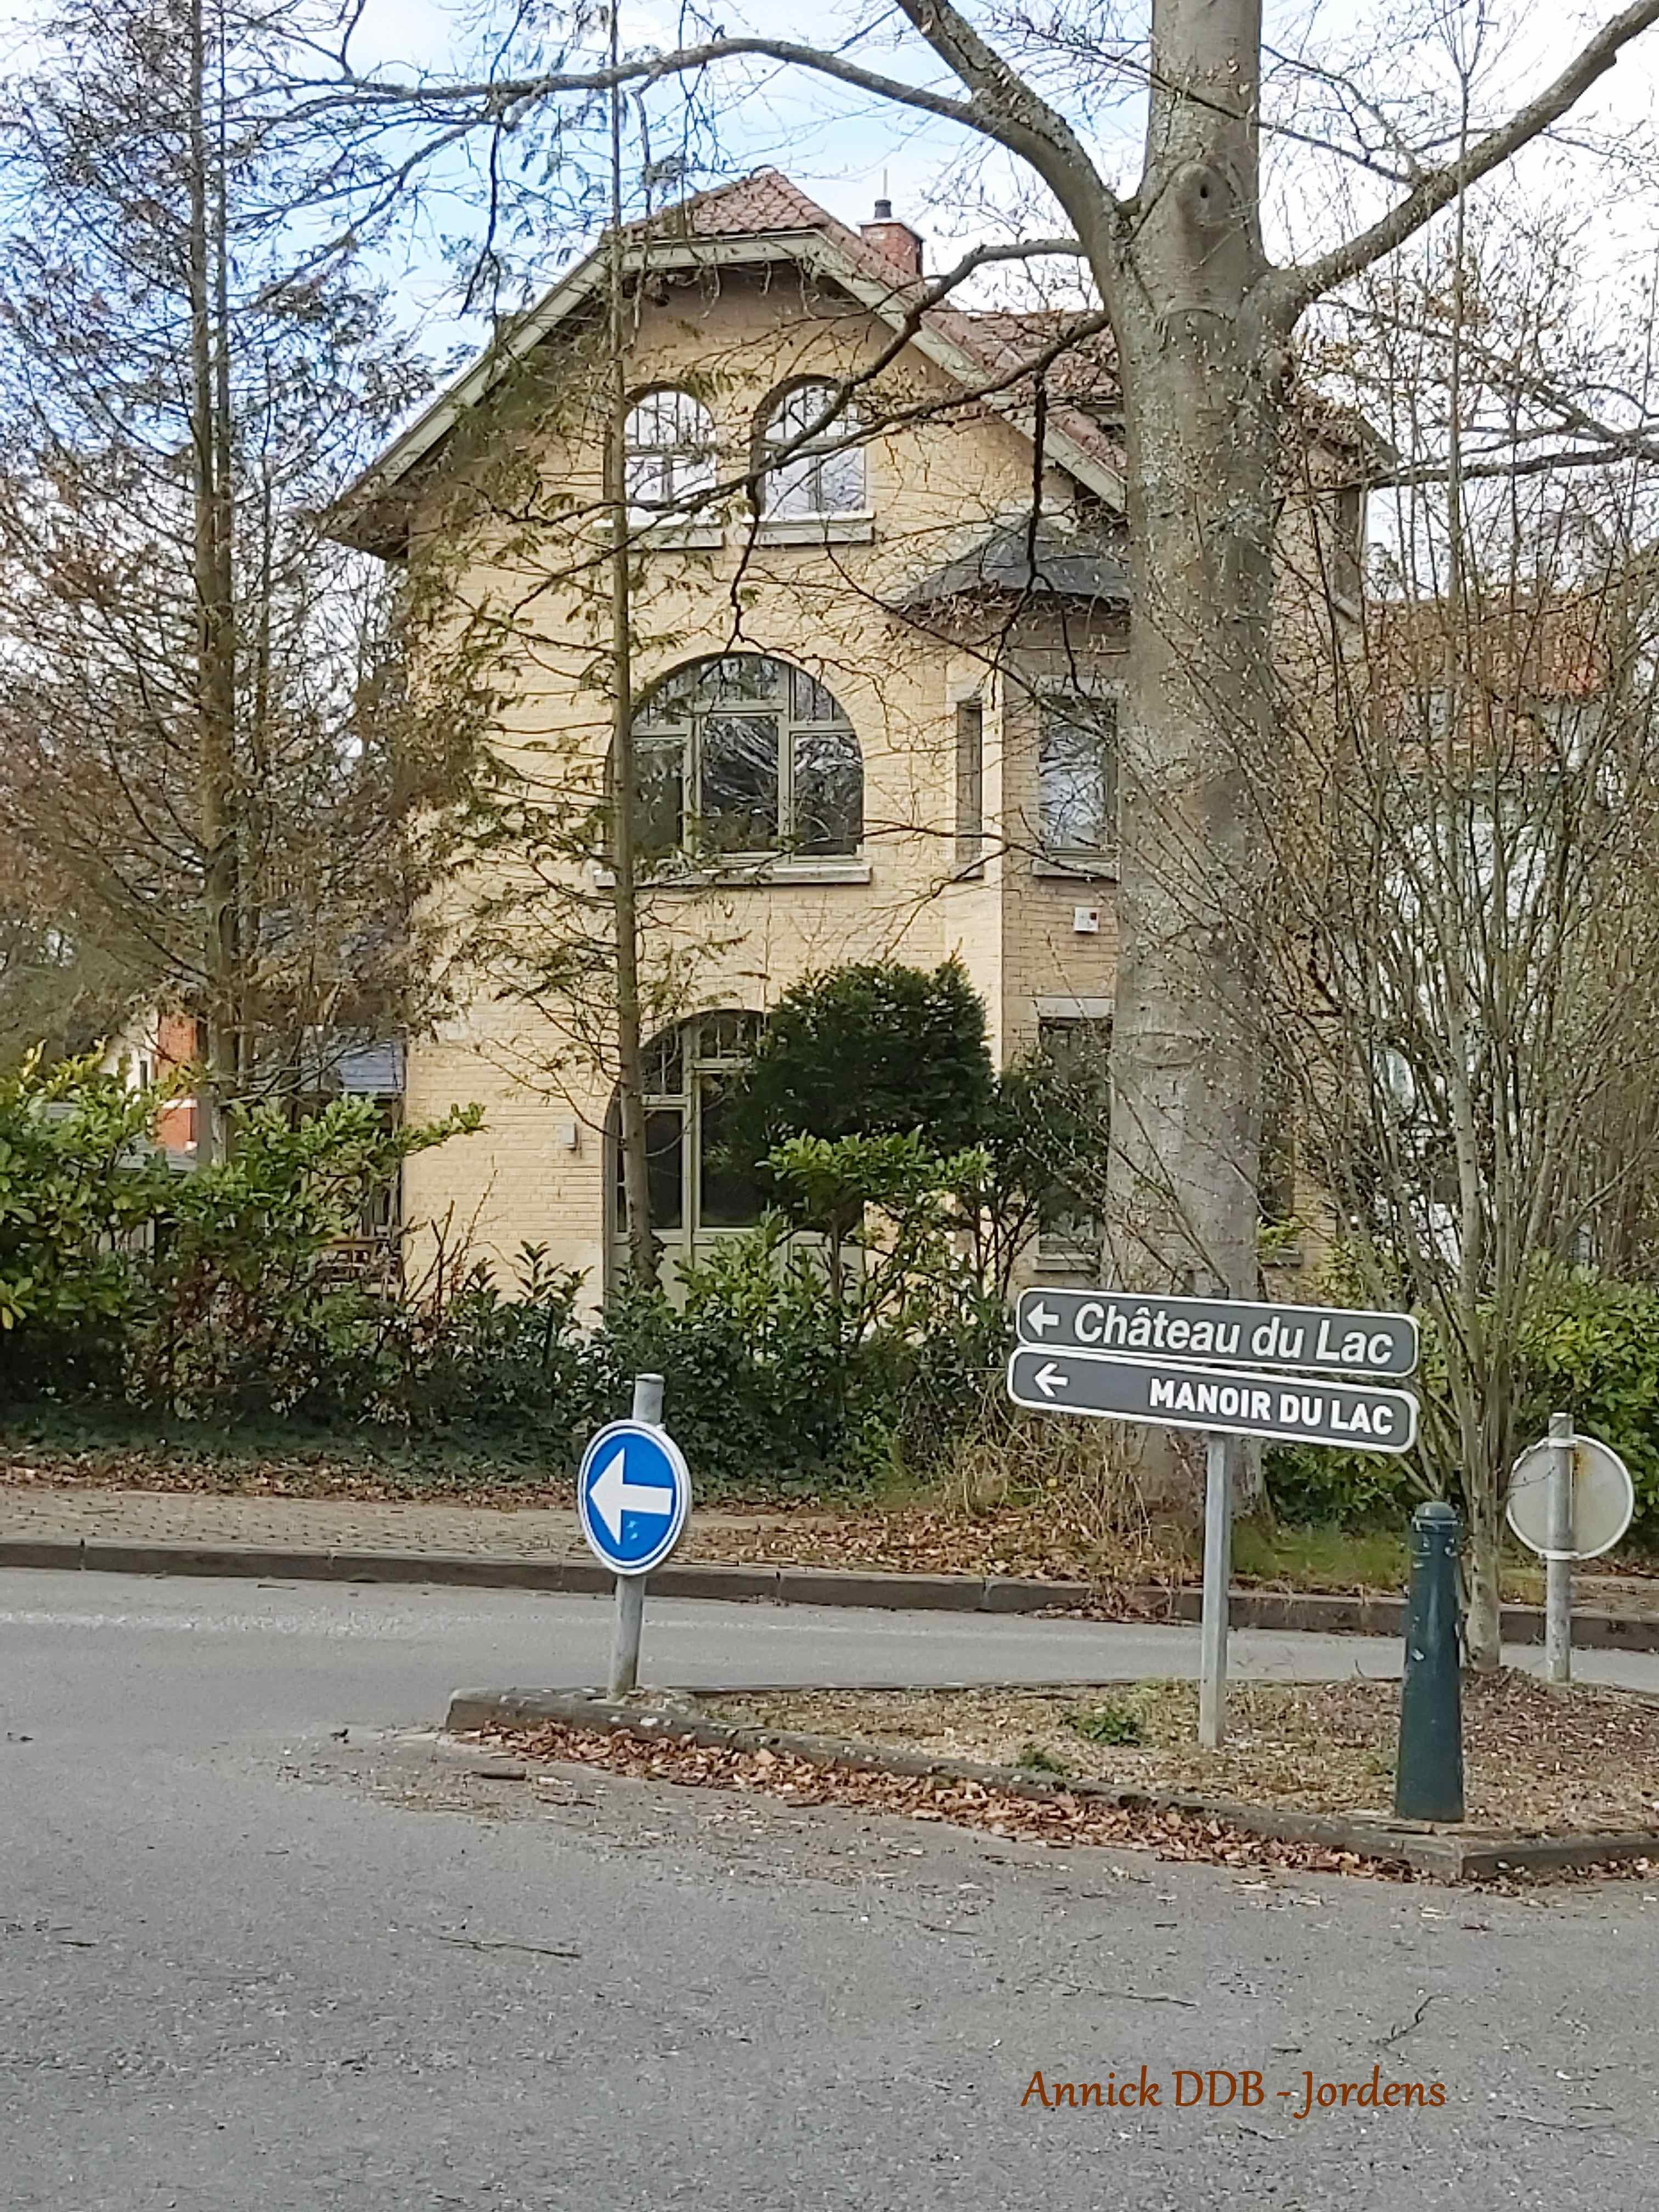 Villa Les Bluets avenue des Merisiers 3 Genval 3.2020 © Annick Dedobbeleer